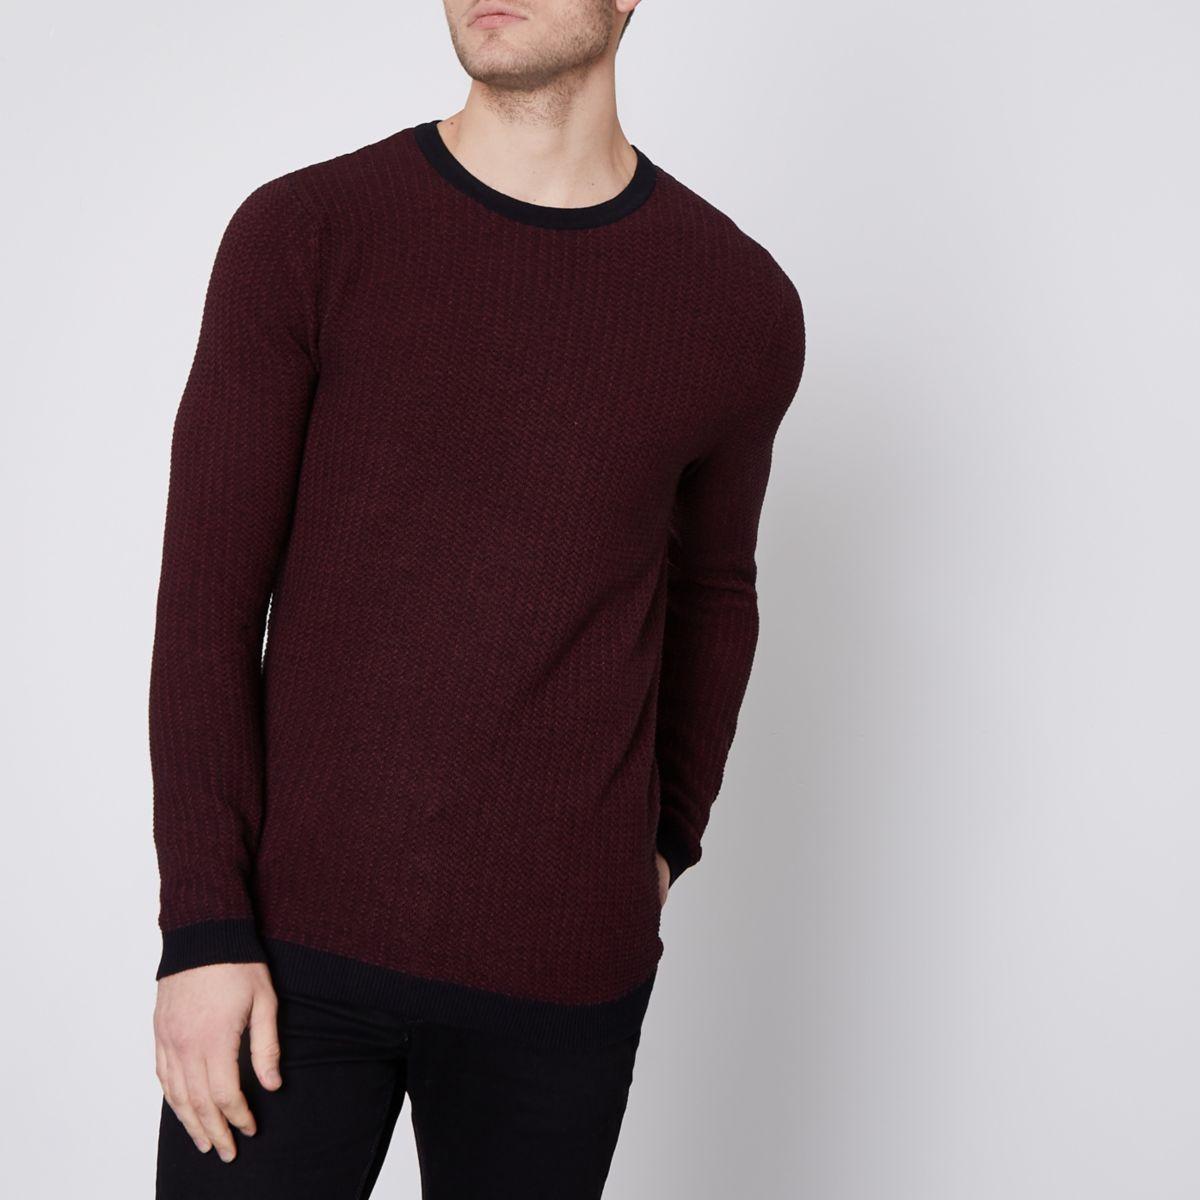 Jack & Jones Premium burgundy knit sweater